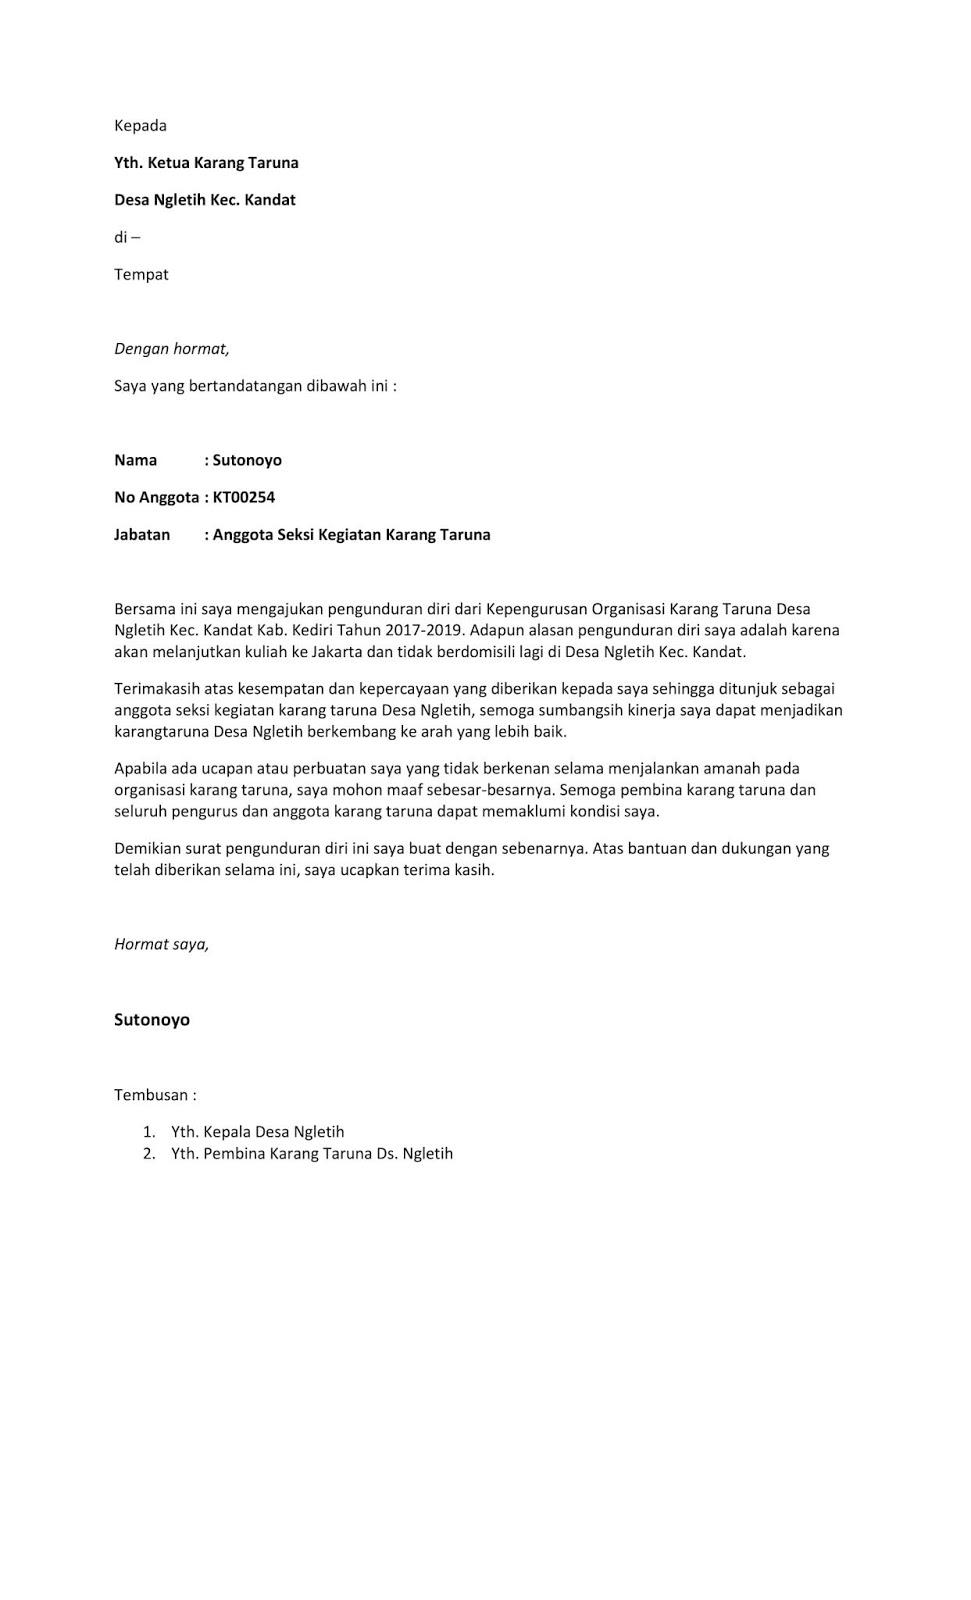 Inilah Contoh Surat Pengunduran Diri Dari Karang Taruna